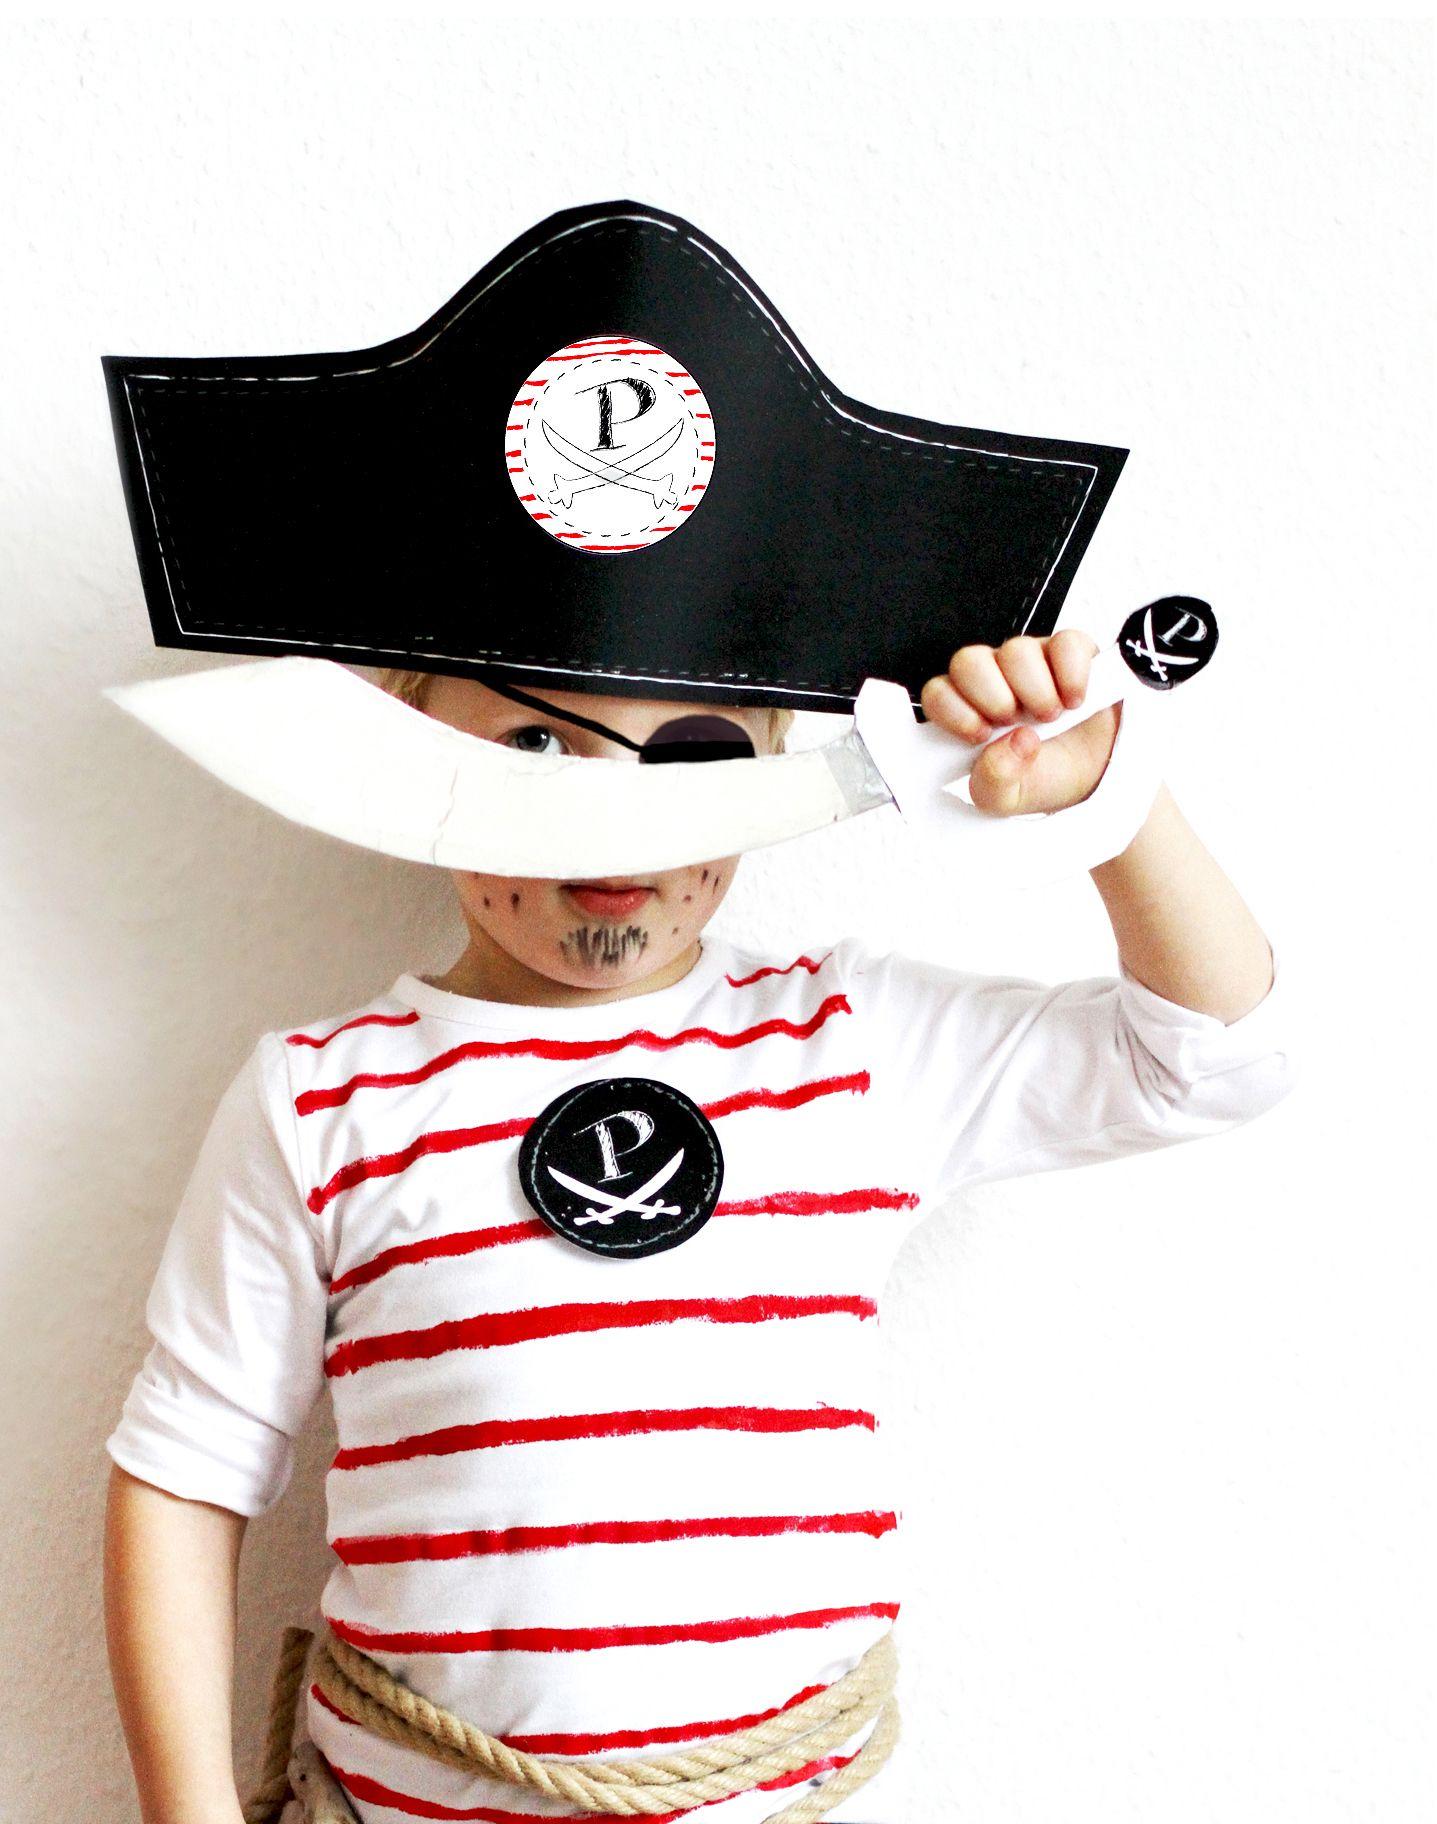 diy piraten kost m einfach selber machen costume kinder kost me. Black Bedroom Furniture Sets. Home Design Ideas